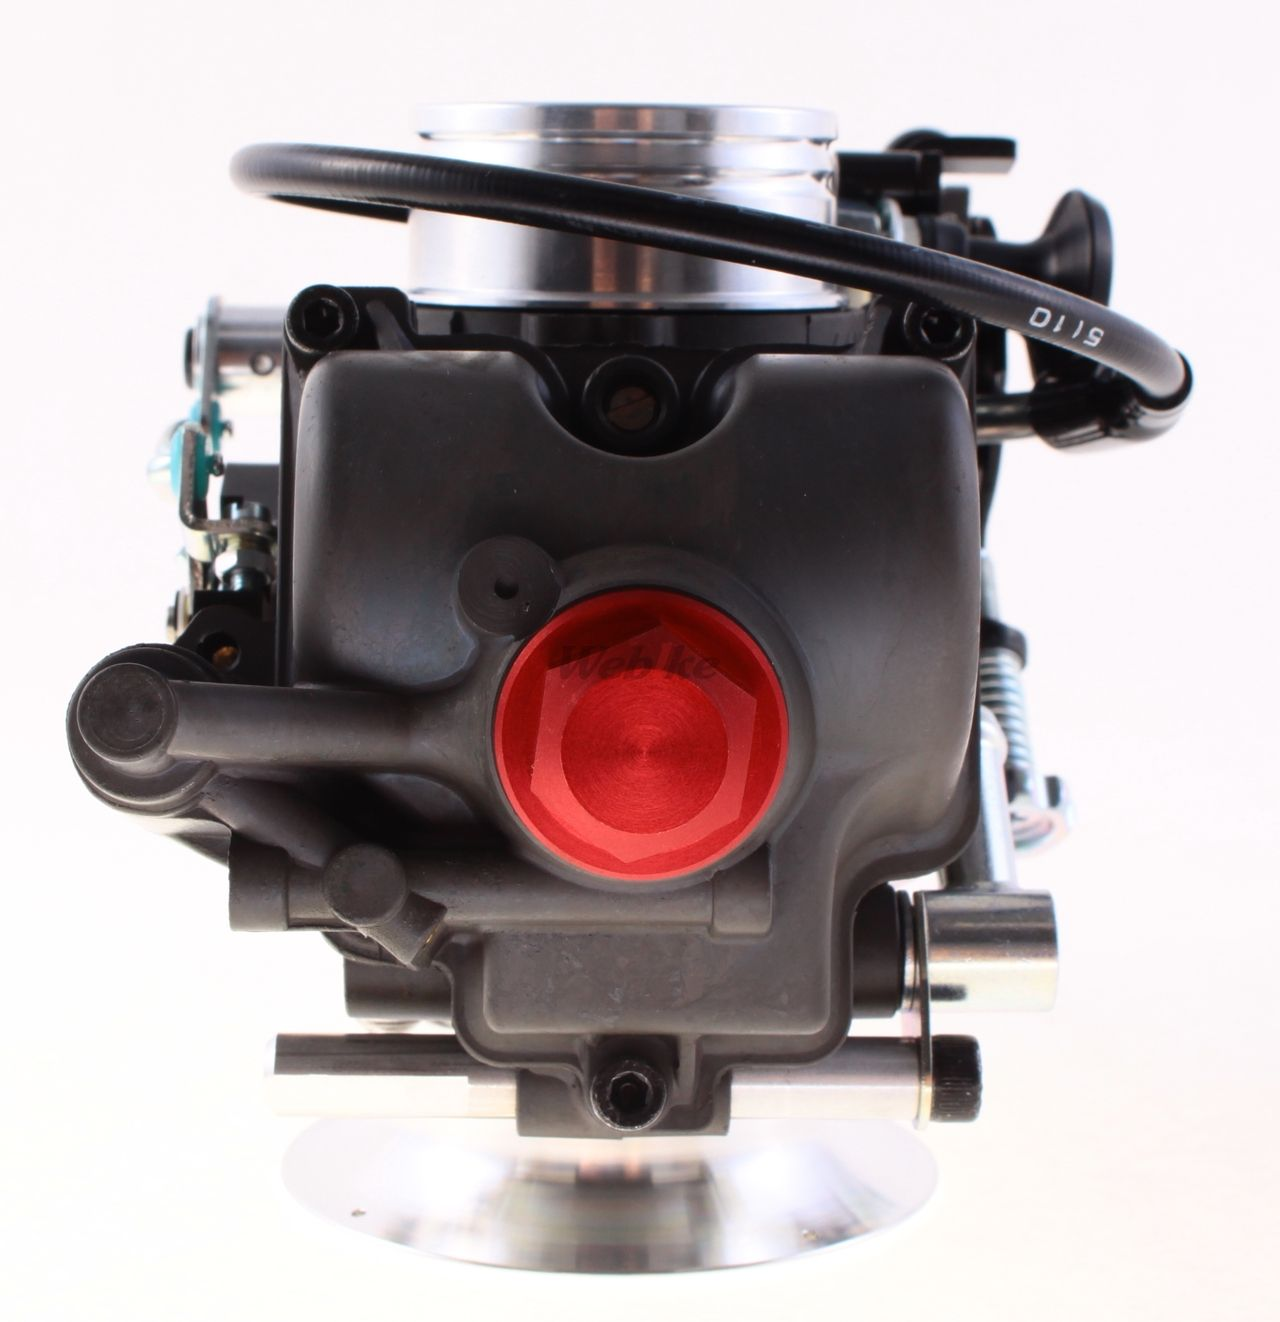 【YOSHIMURA】TMR-MJN40化油器套件 - 「Webike-摩托百貨」